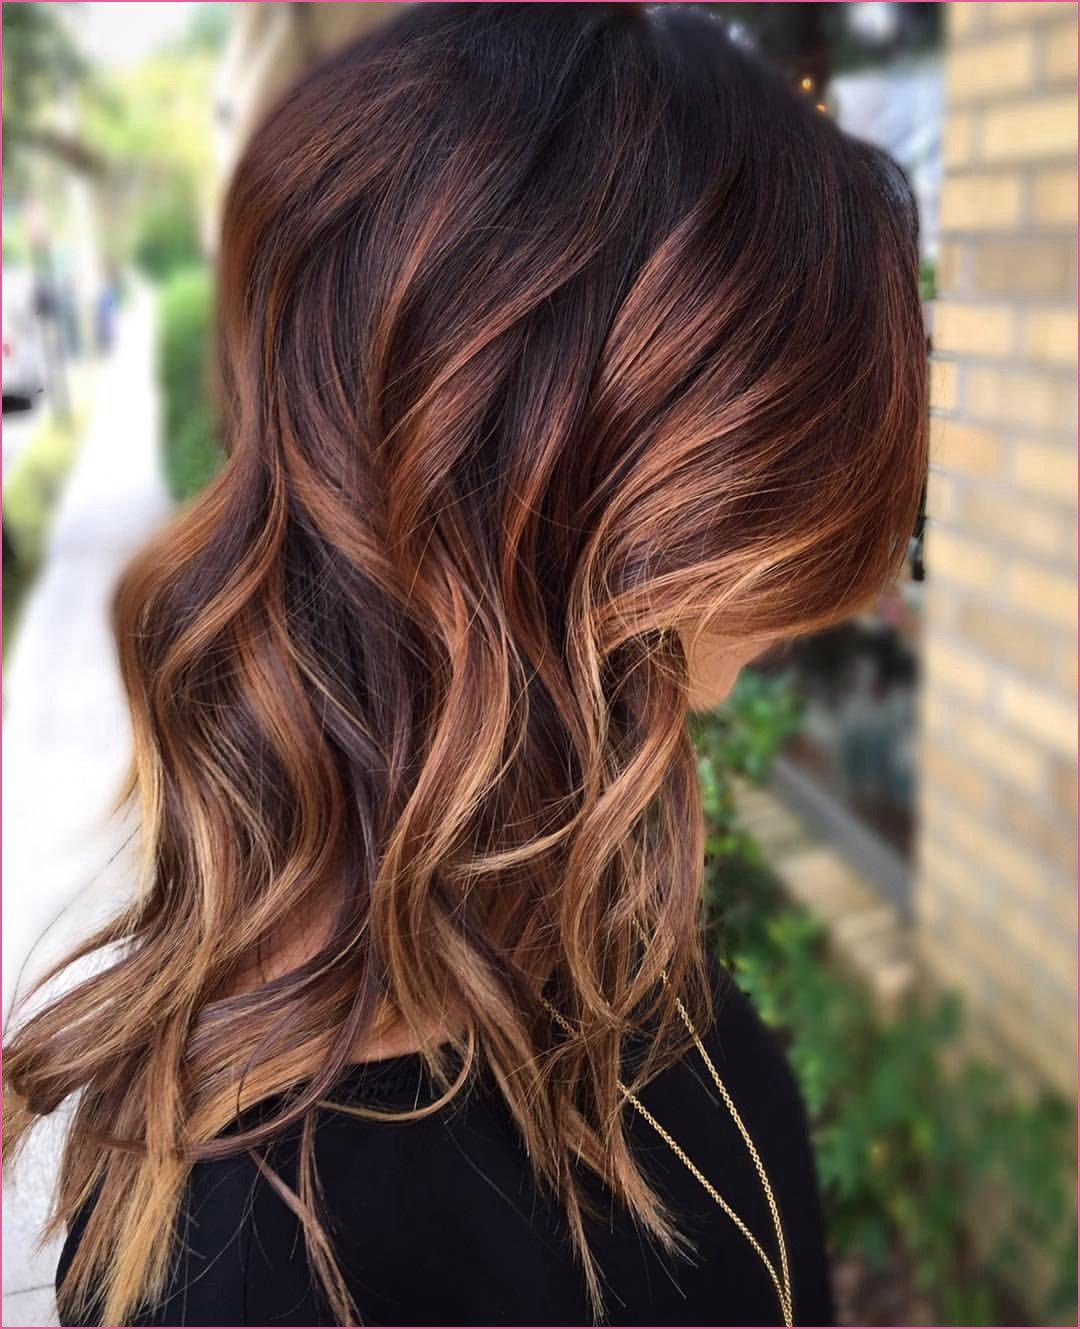 Frisuren Lang Braun Haarfarben Kastanienbraune Haarfarbe Frisur Ideen